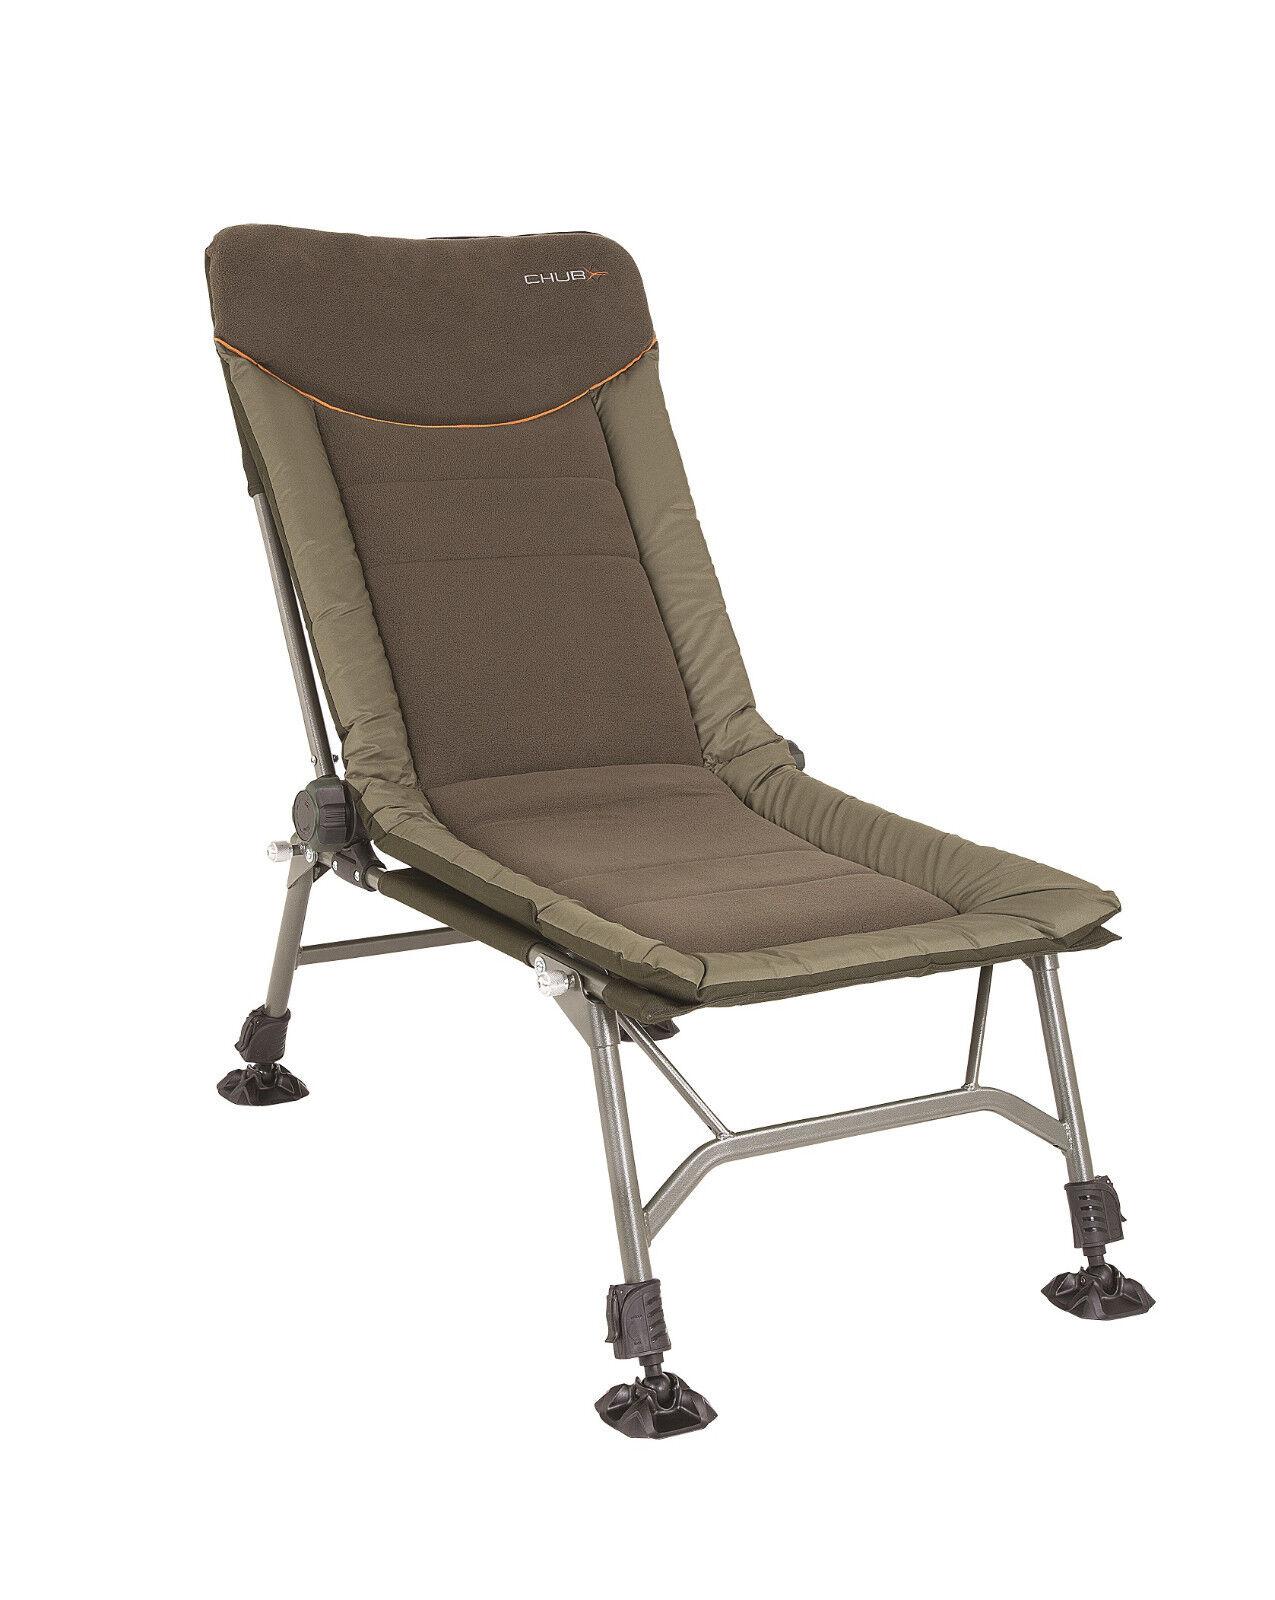 Chub Vantage Chair 1378159 Stuhl Angelstuhl Karpfenstuhl Sitz Carpchair Carp